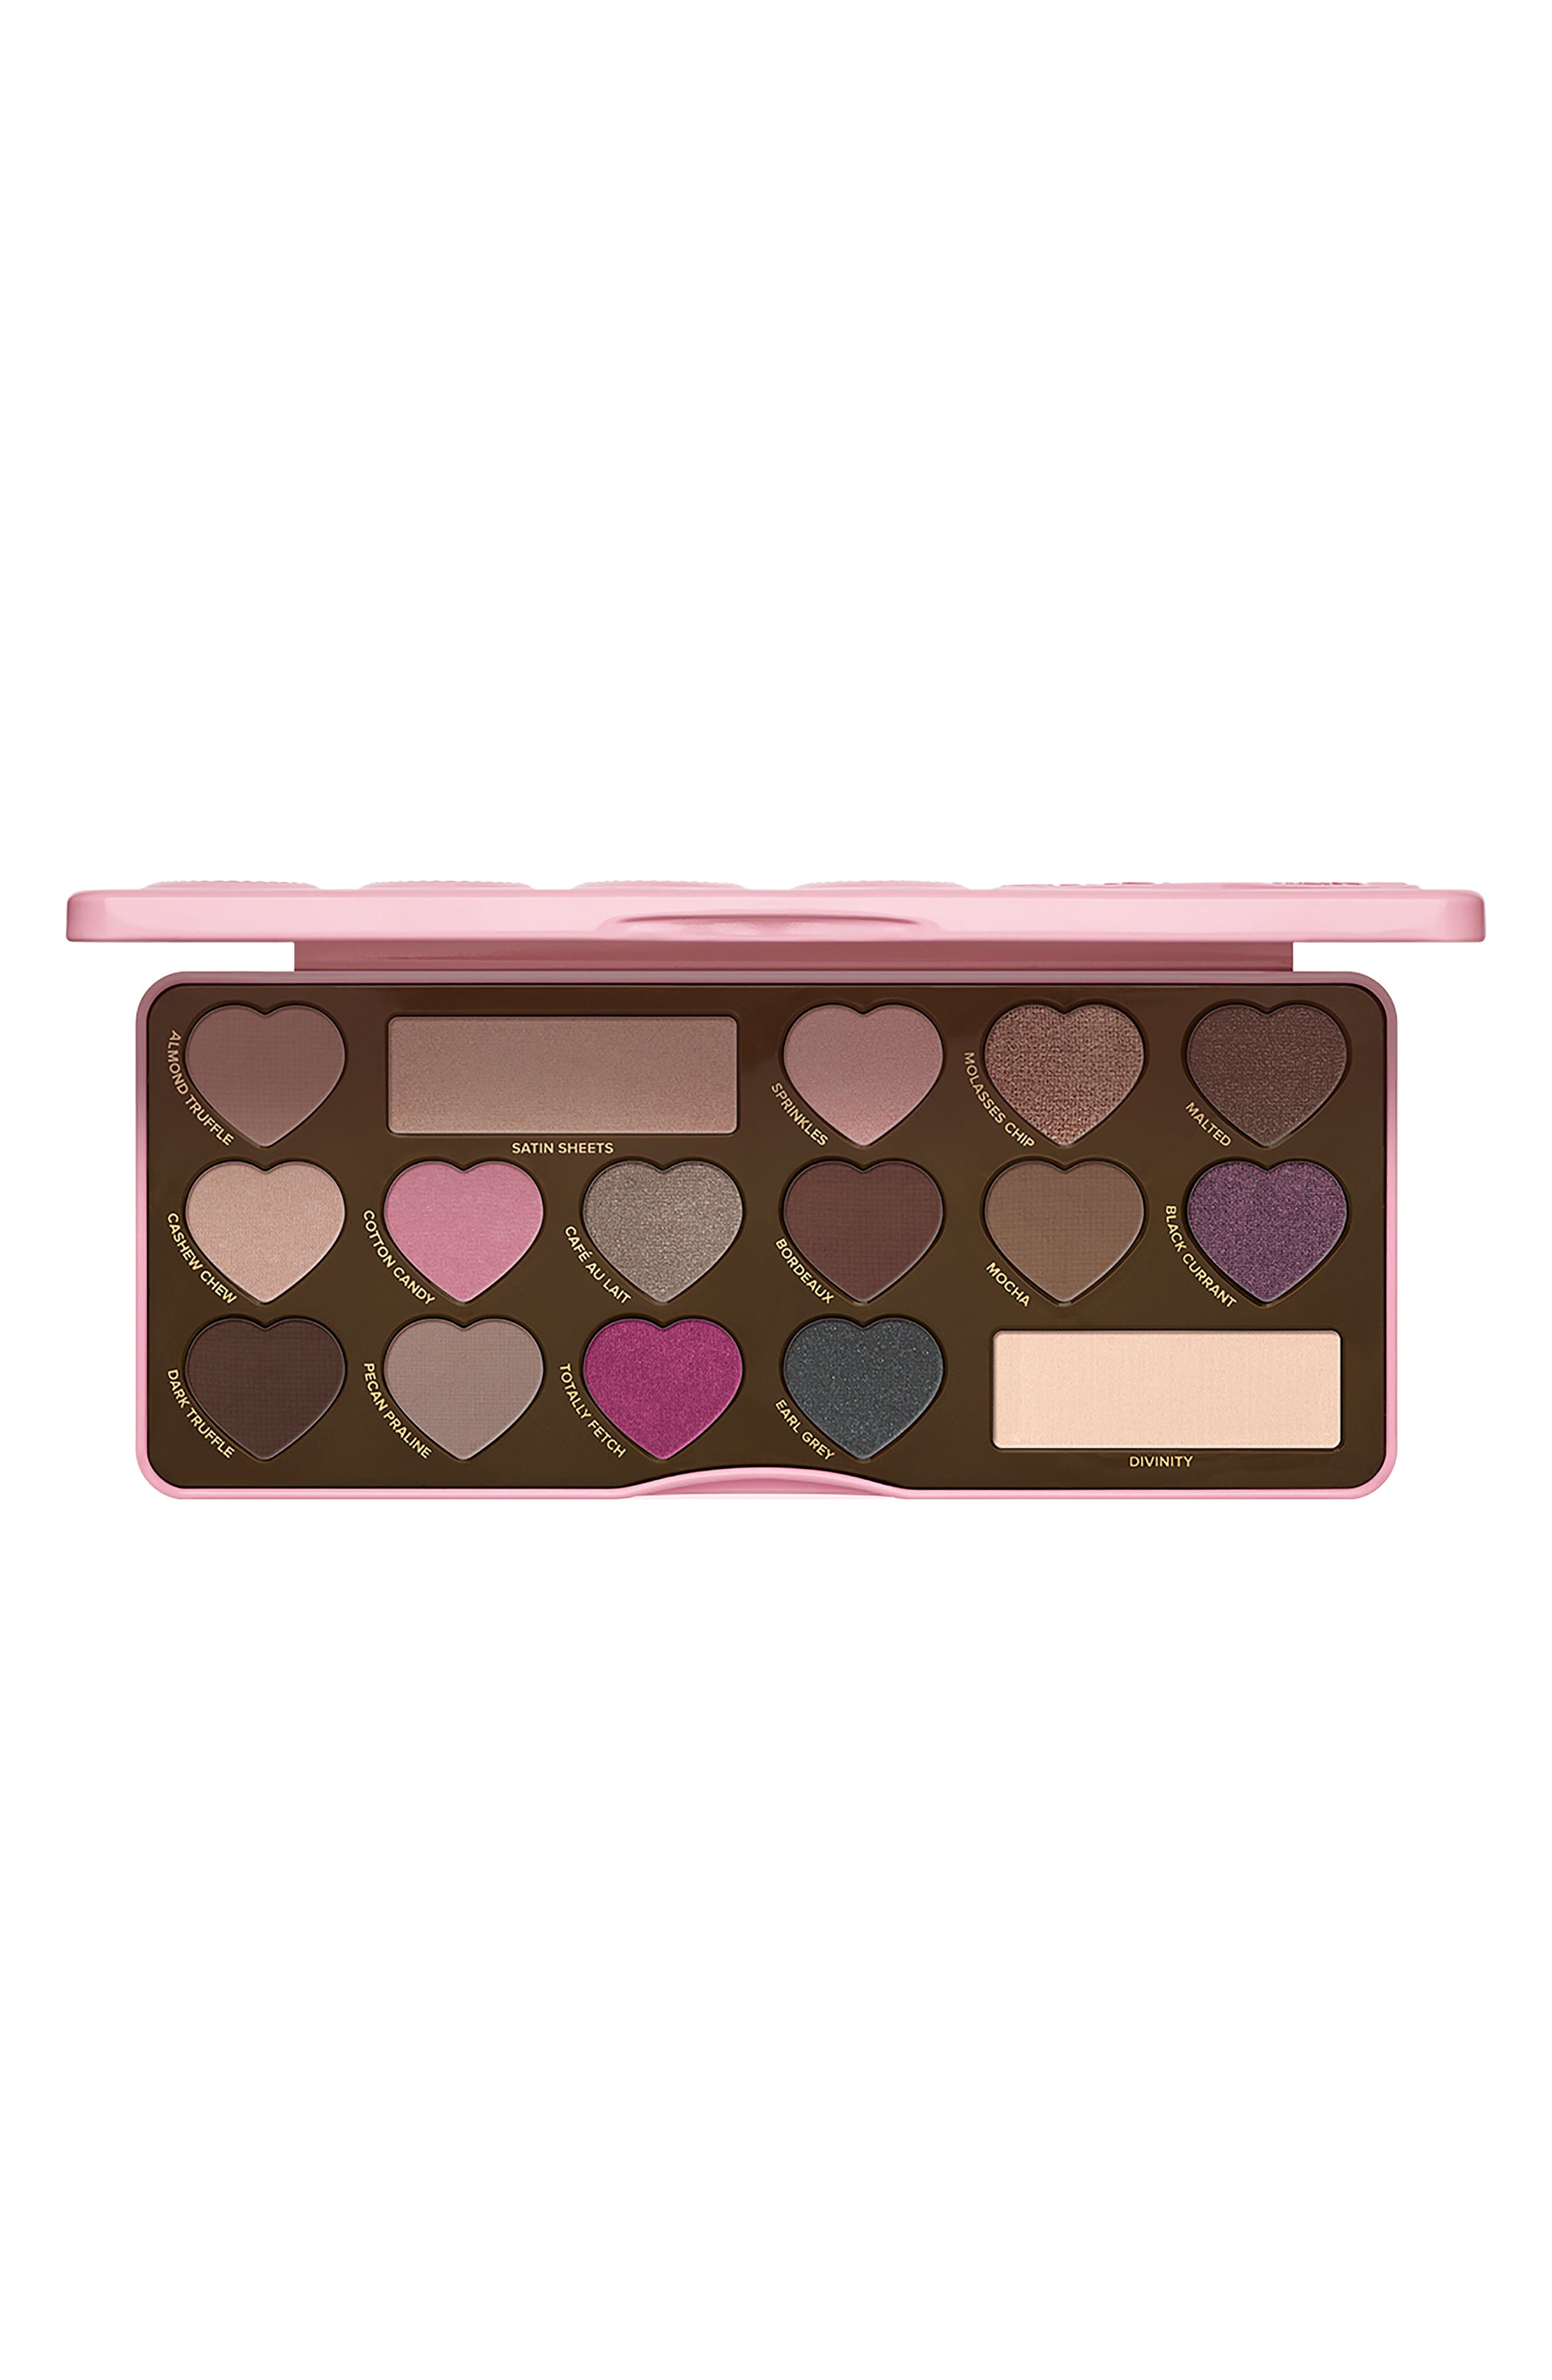 Chocolate Bon Bons Eyeshadow Palette,                             Alternate thumbnail 5, color,                             No Color